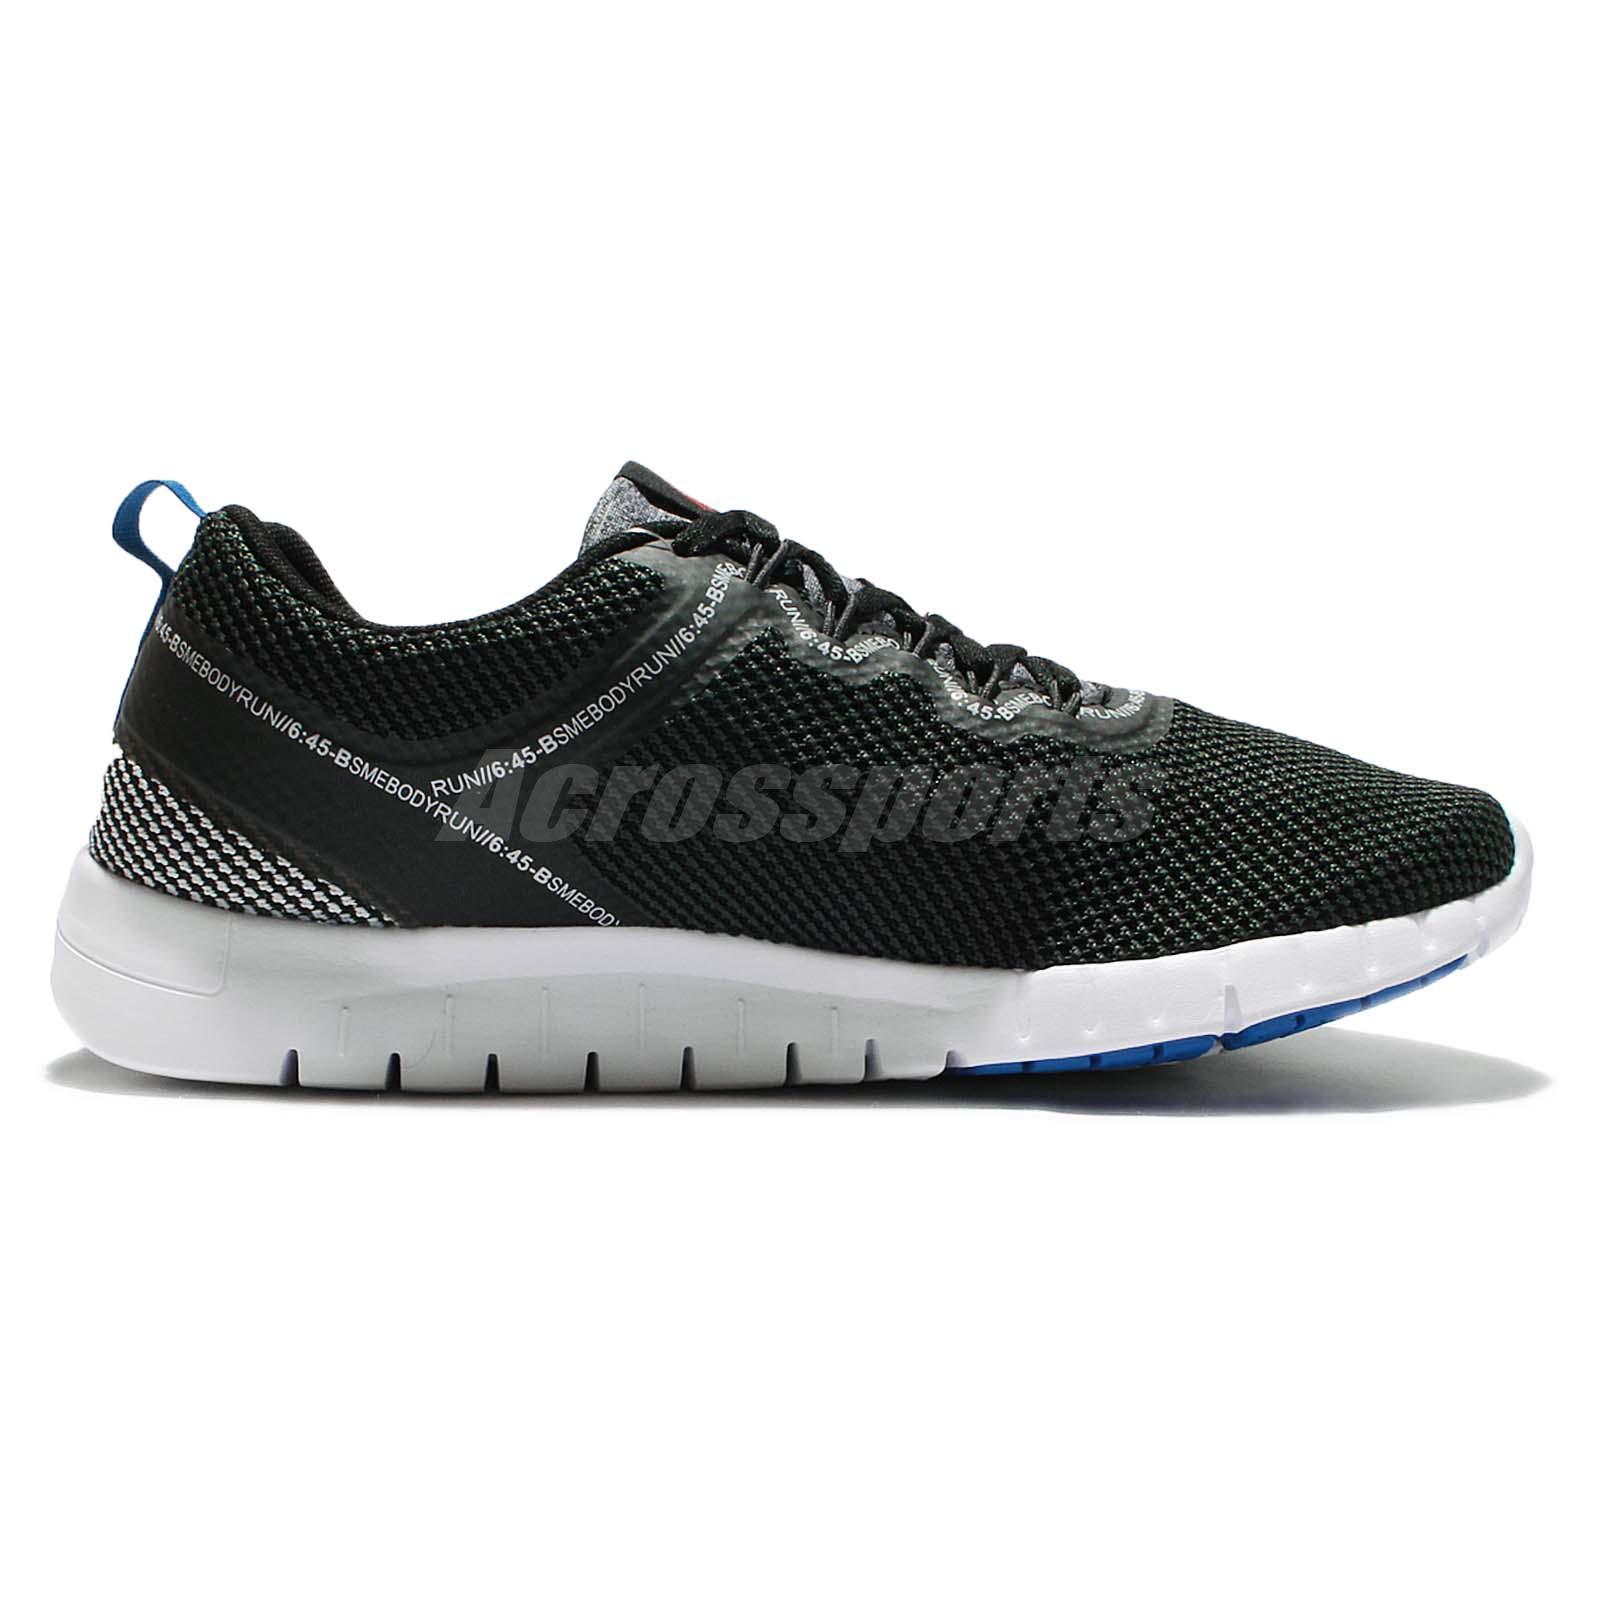 Reebok Men's Zquick 2.0 Running Shoe,Black/High Viscous Green/White,11;  Condition: Brand New With Box